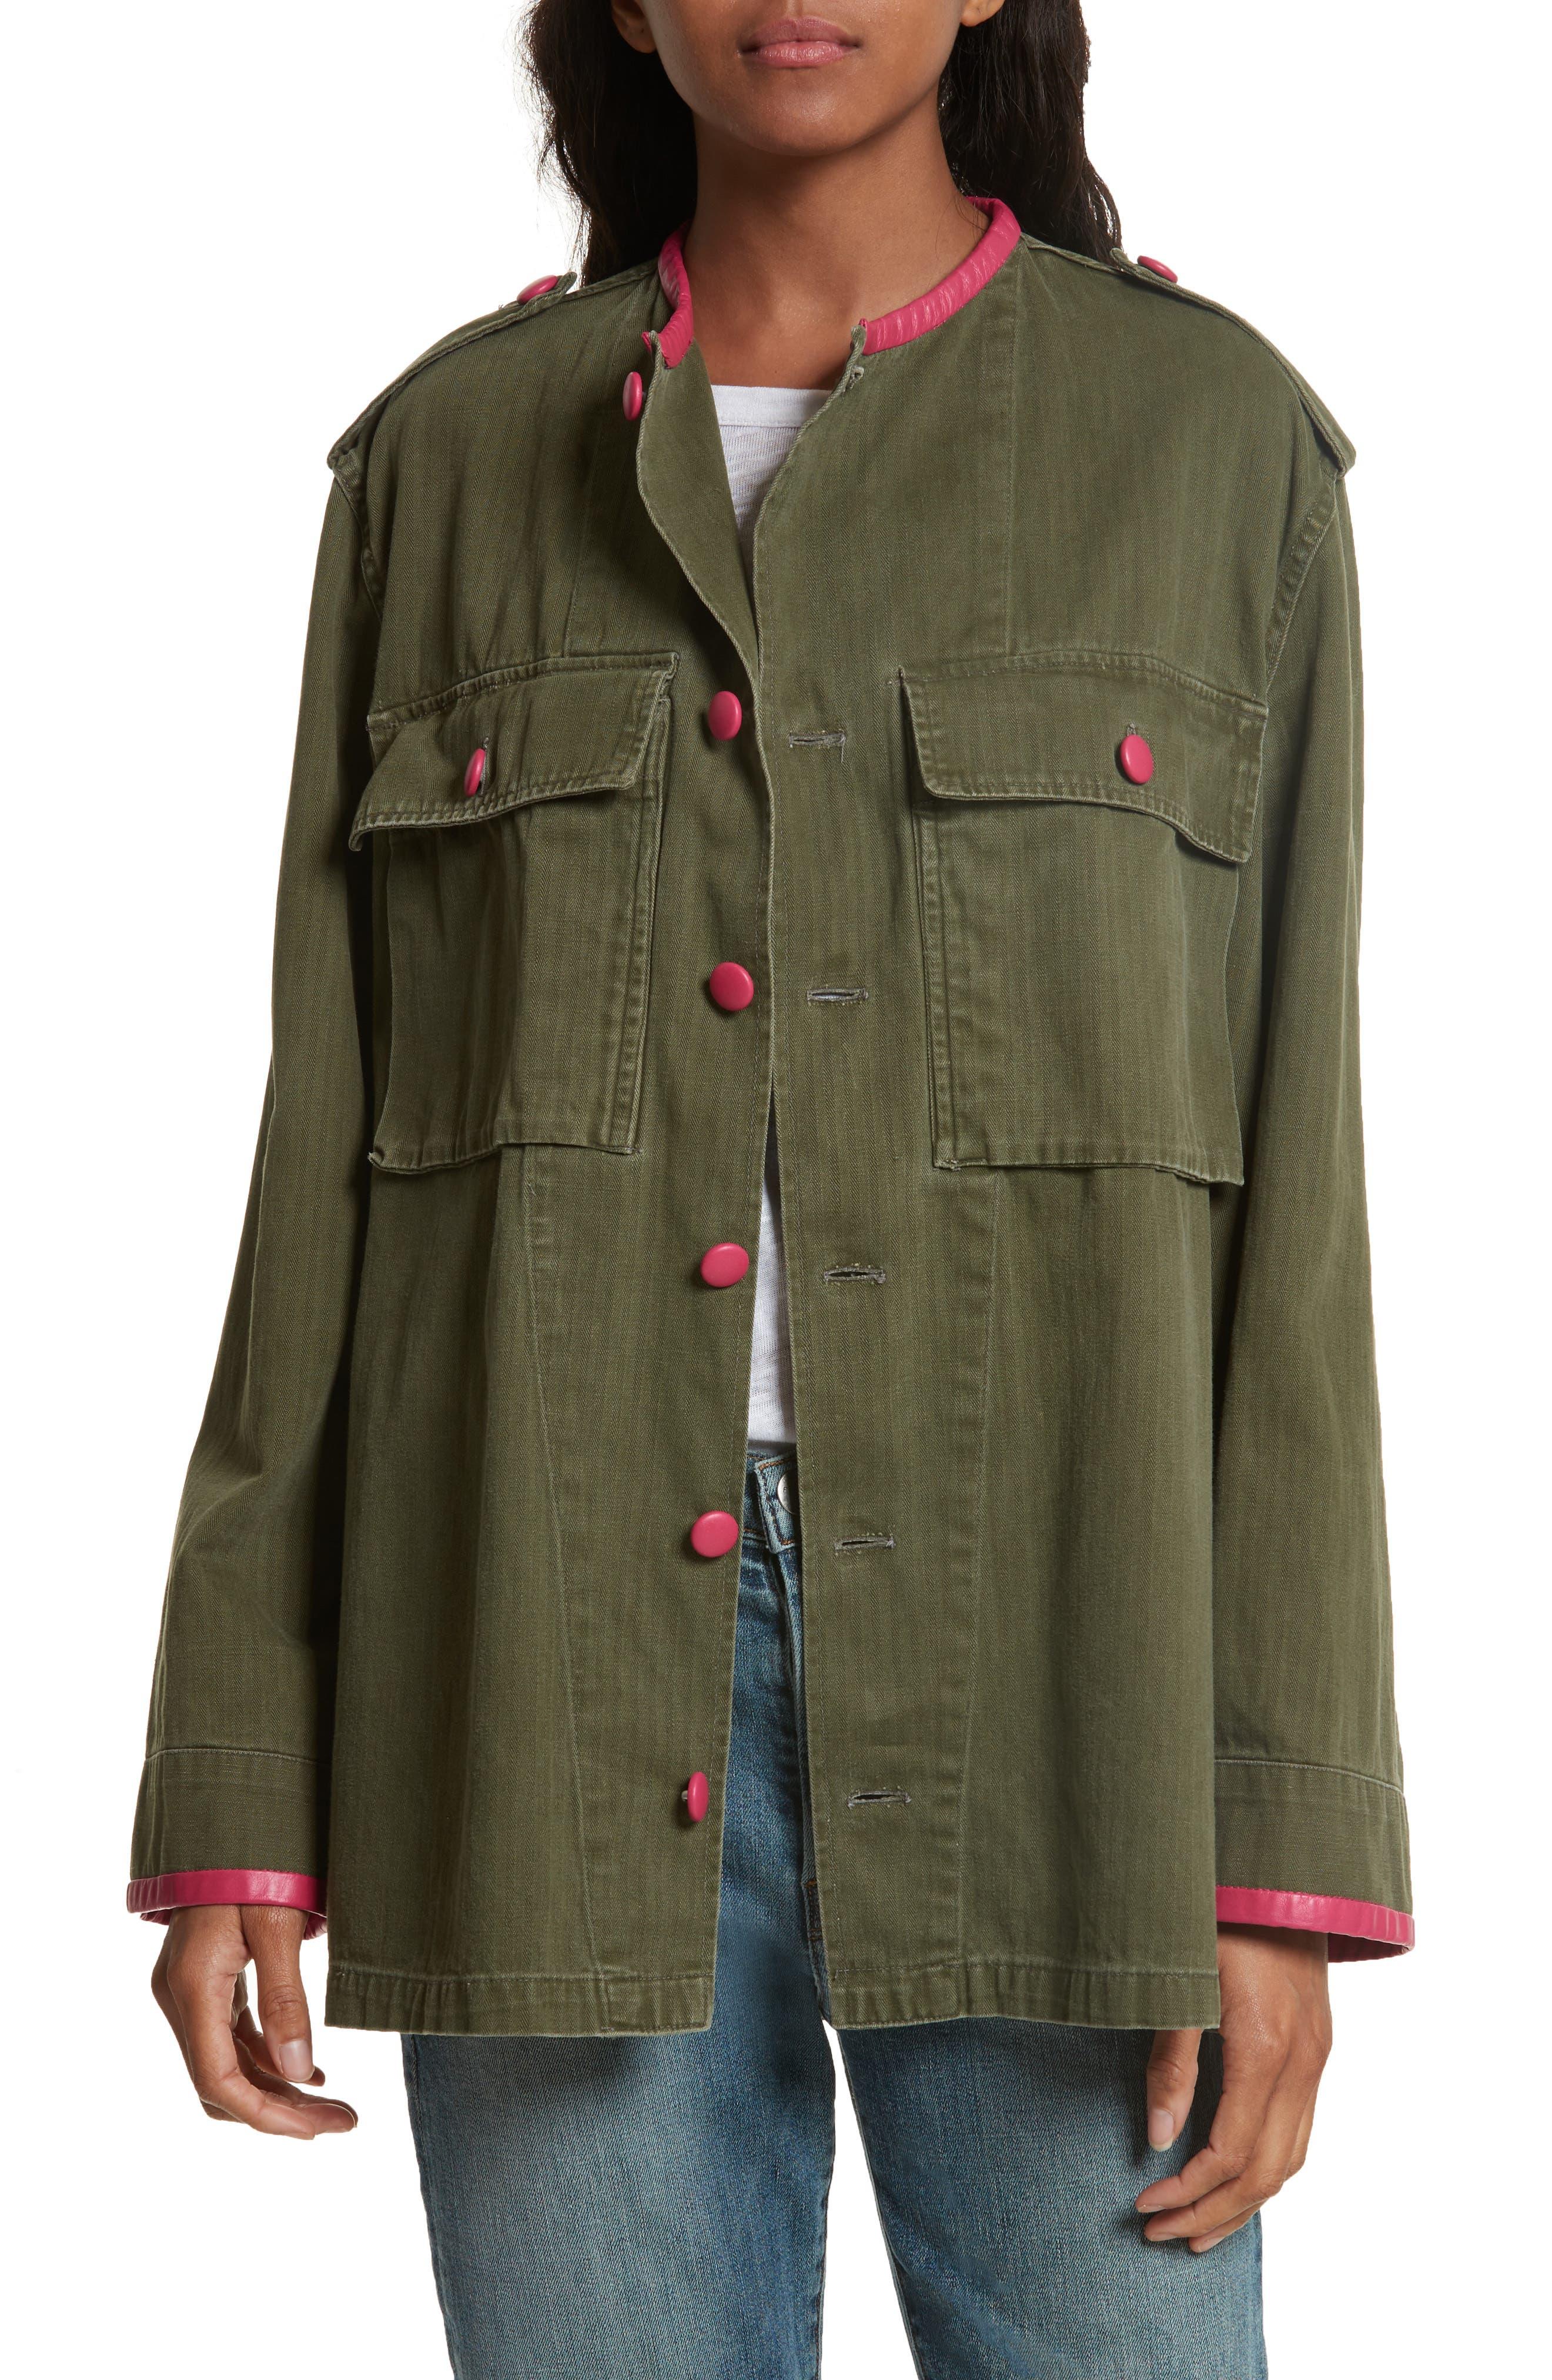 Main Image - Harvey Faircloth Leather Trim Vintage Army Jacket